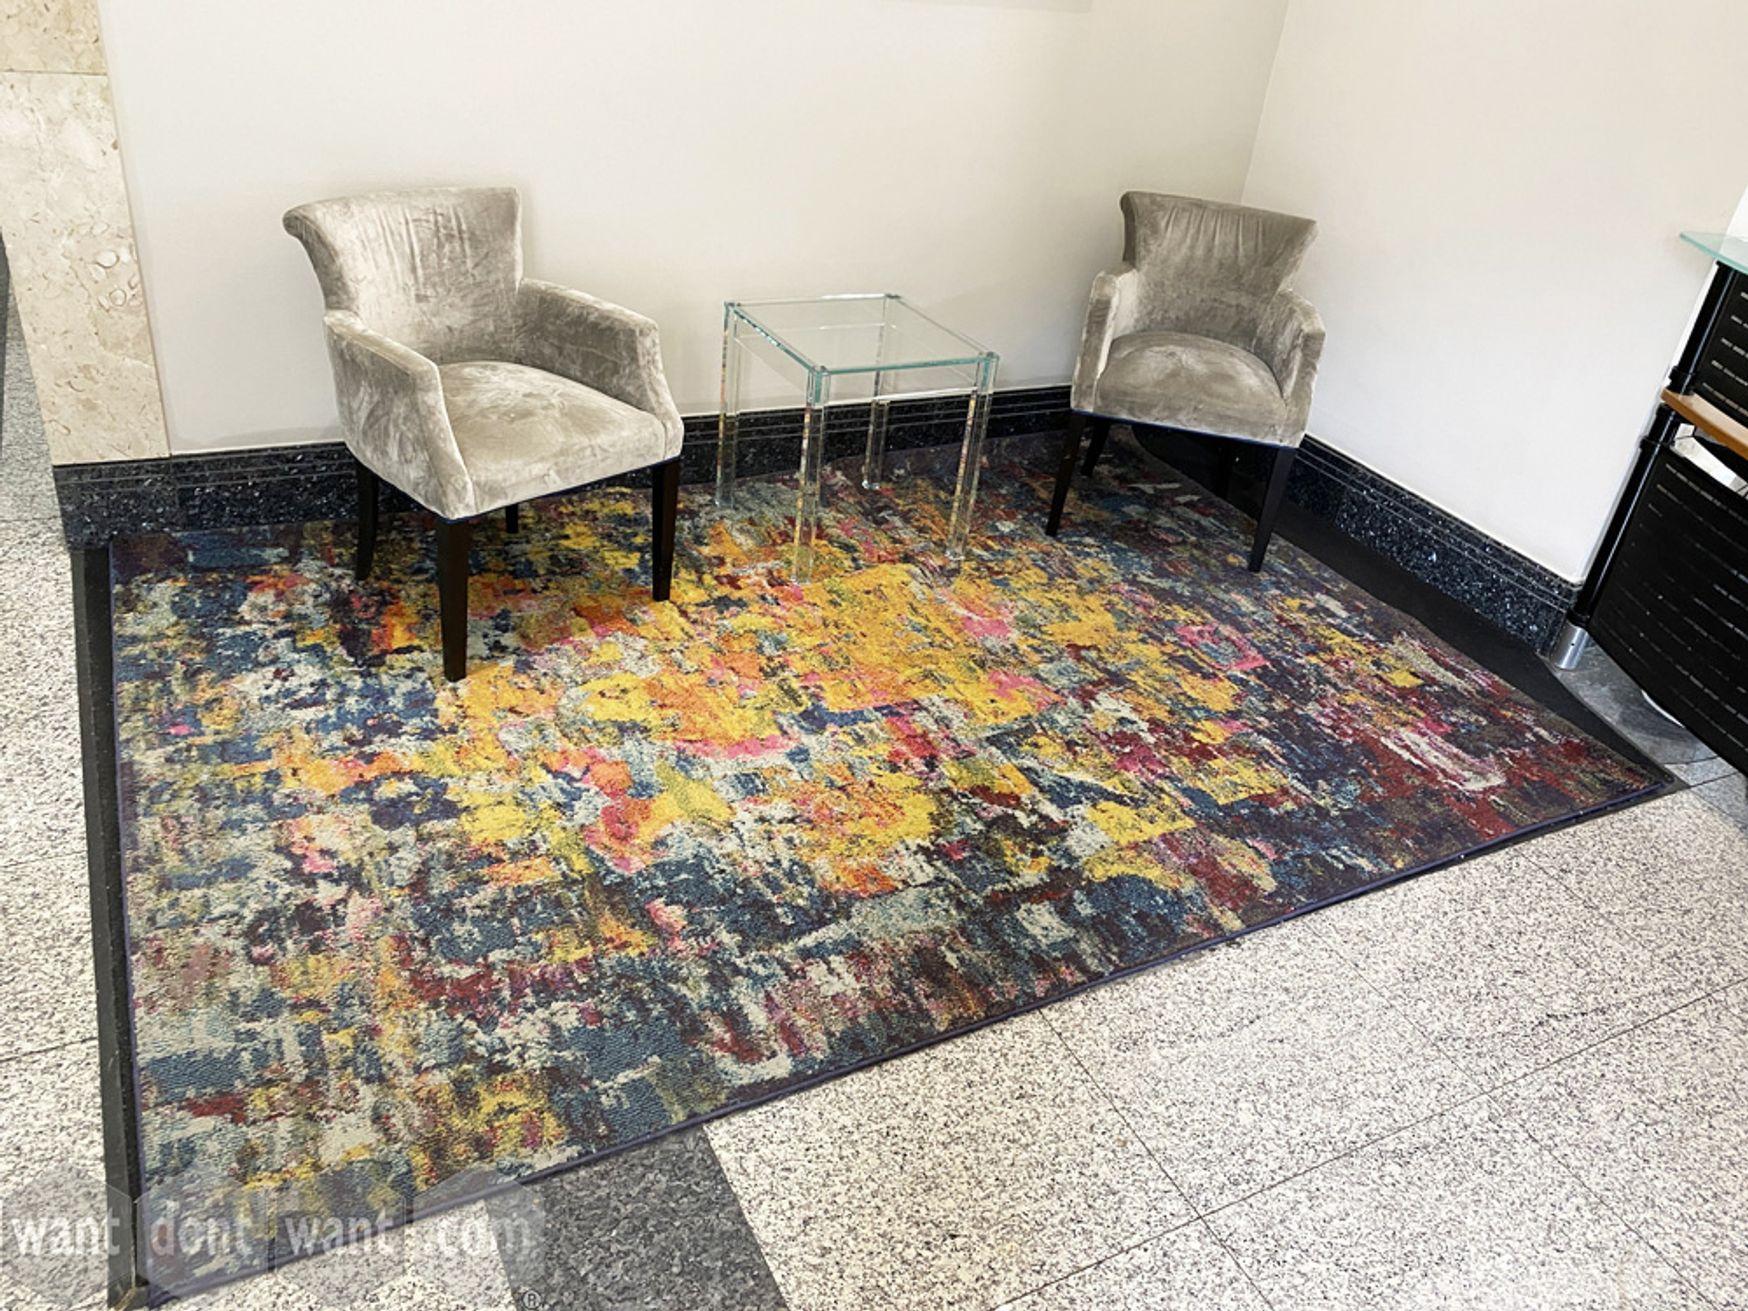 Used multi-coloured rug - 2920mm wide x 2000mm deep